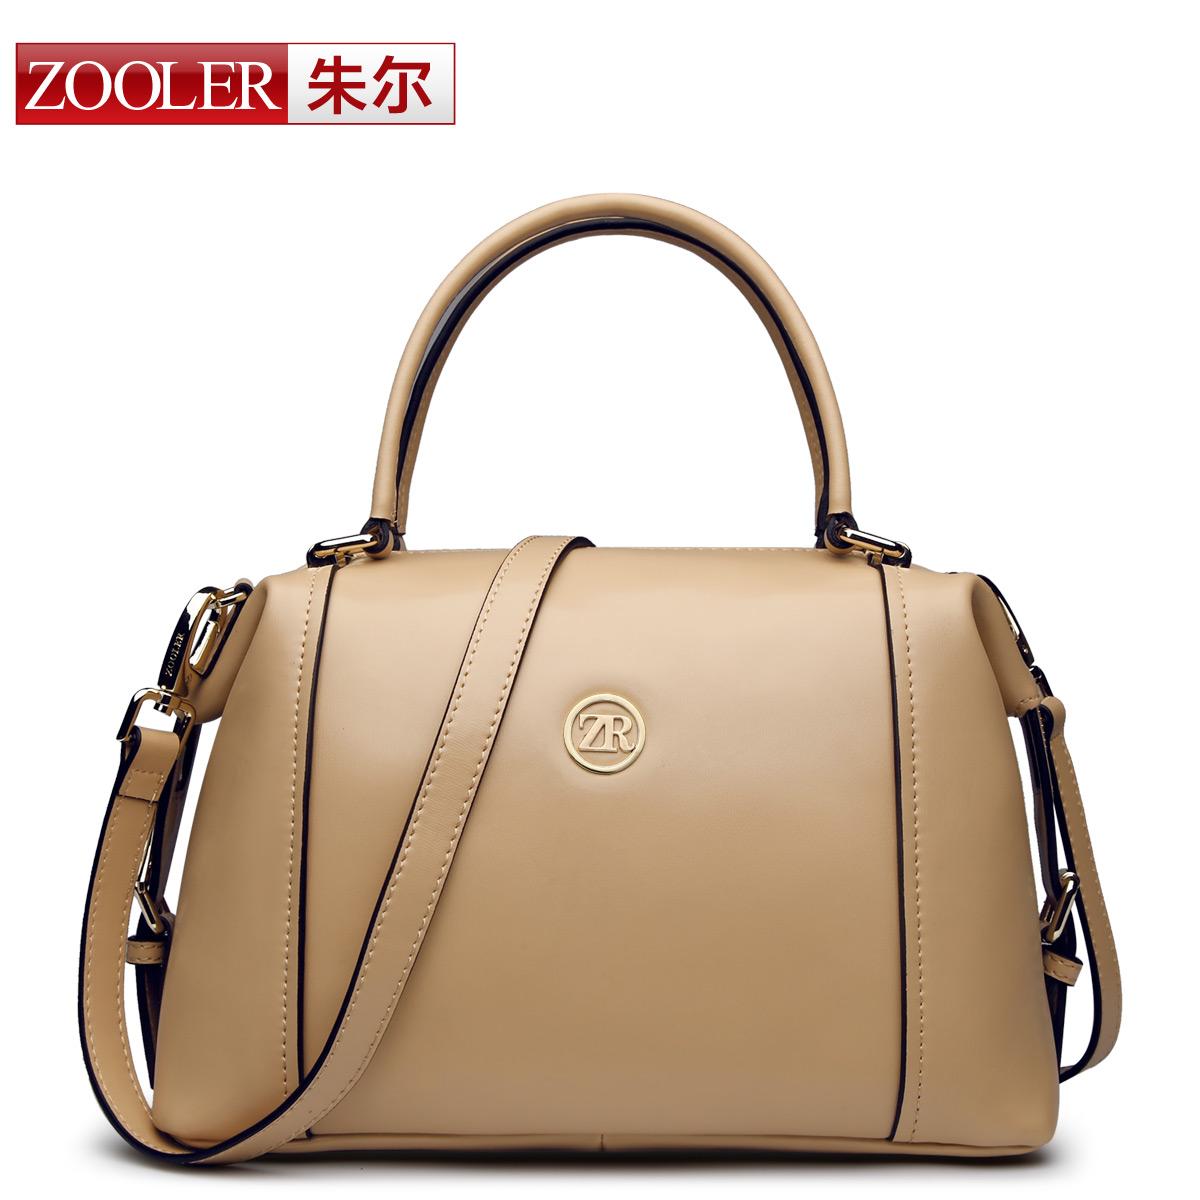 ZOOLER brand women bag 2014 new solid genuine leather women's handbag fashion leisure handbag /bags handbags women famous brands(China (Mainland))